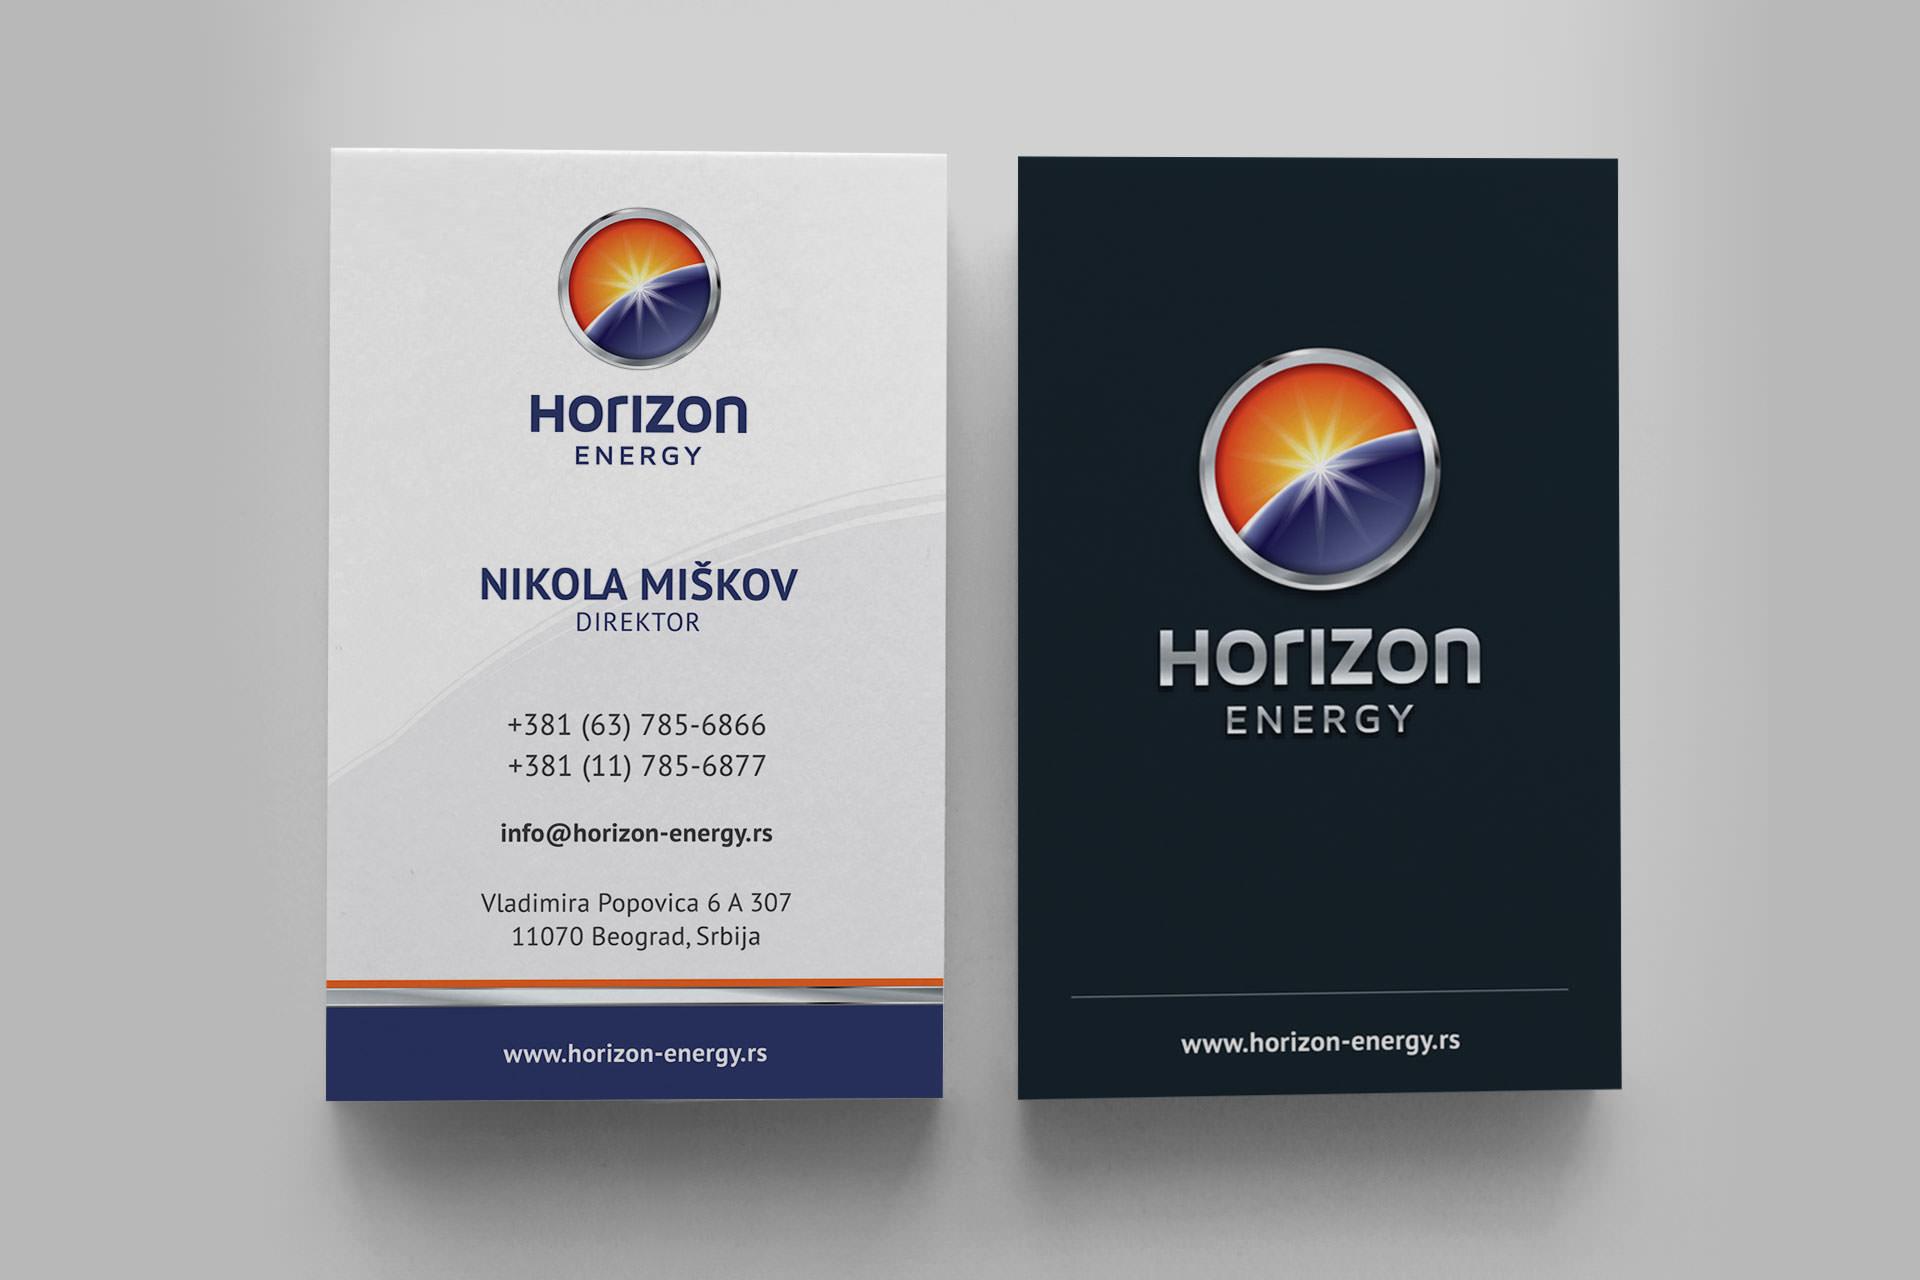 Dizajn vizit karte za Horizon Energy